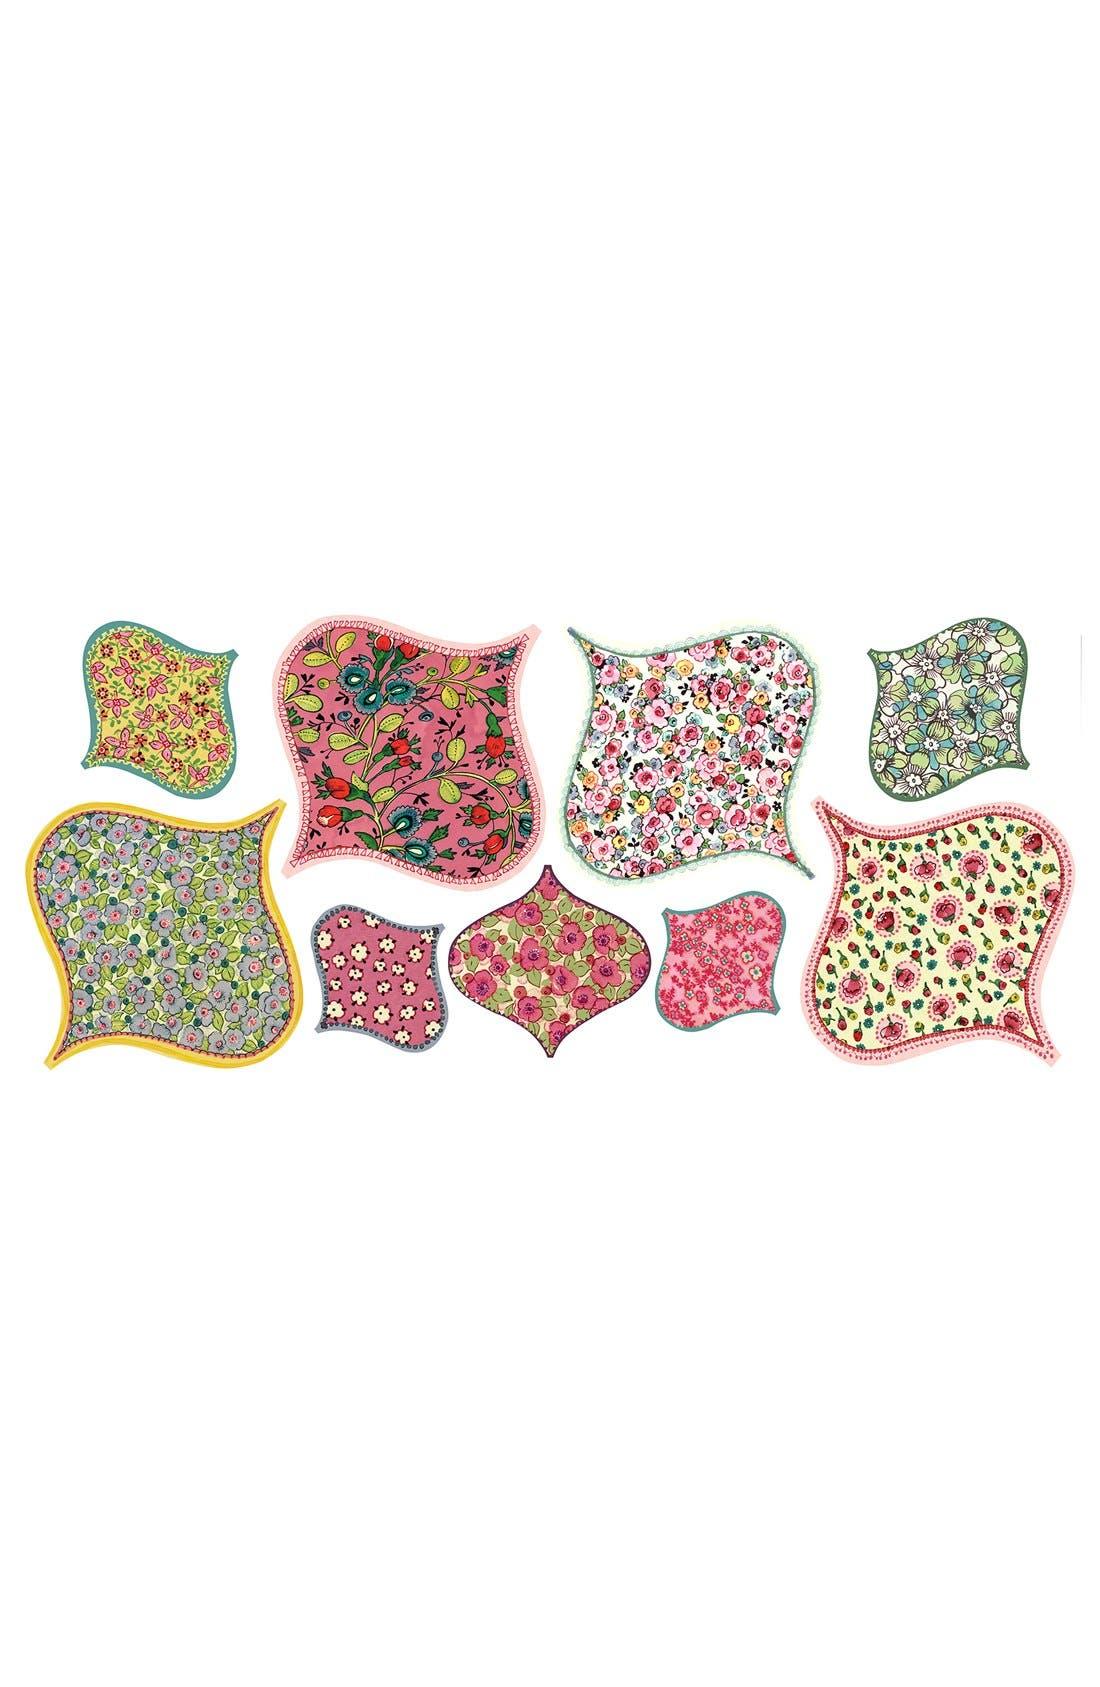 Alternate Image 3  - Wallpops 'Boho Chic' Wall Art Decal Kit (Set of 18)